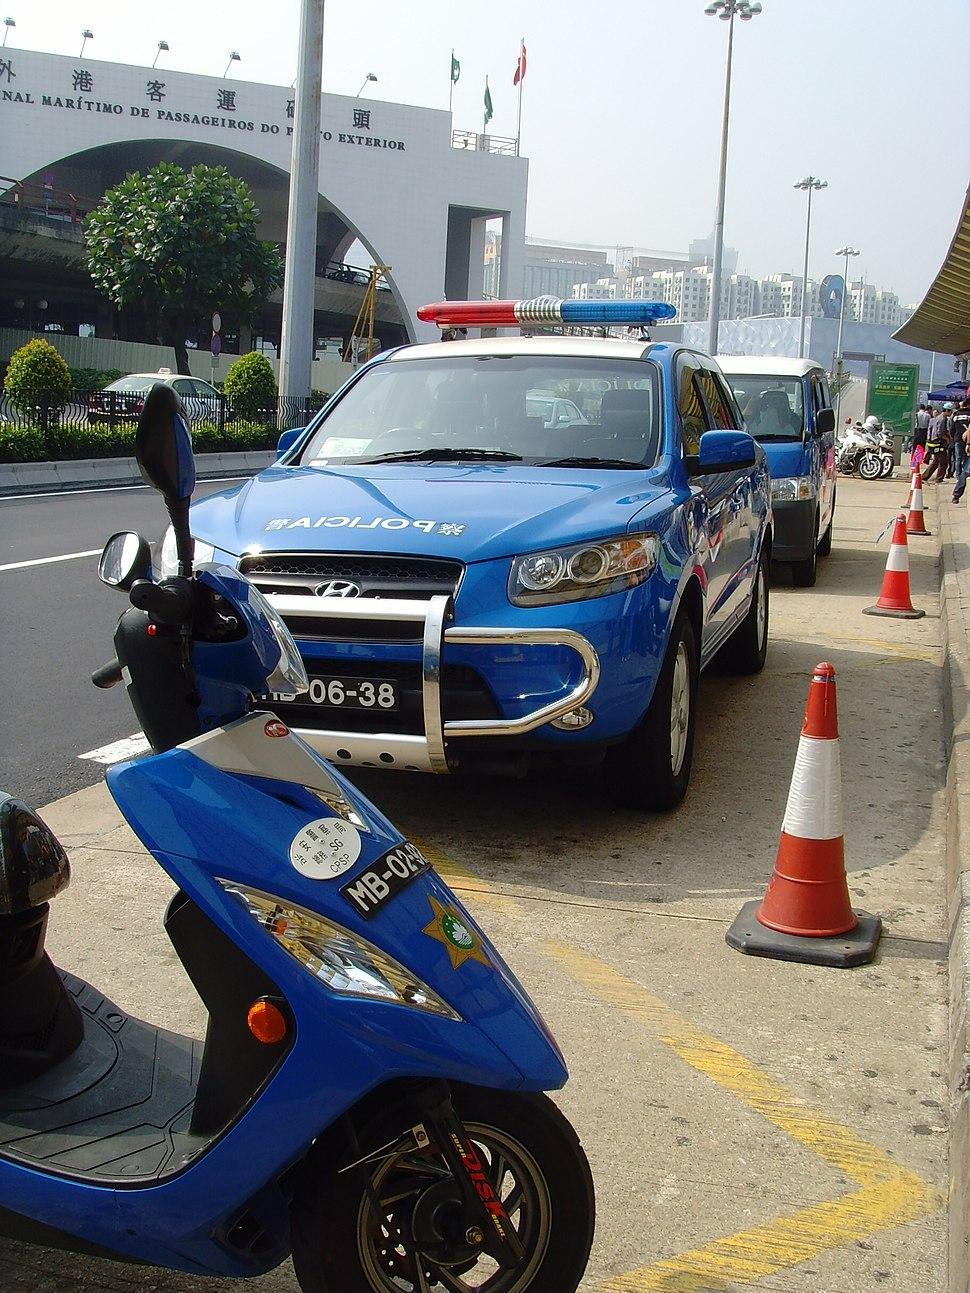 PSPFM vehicles